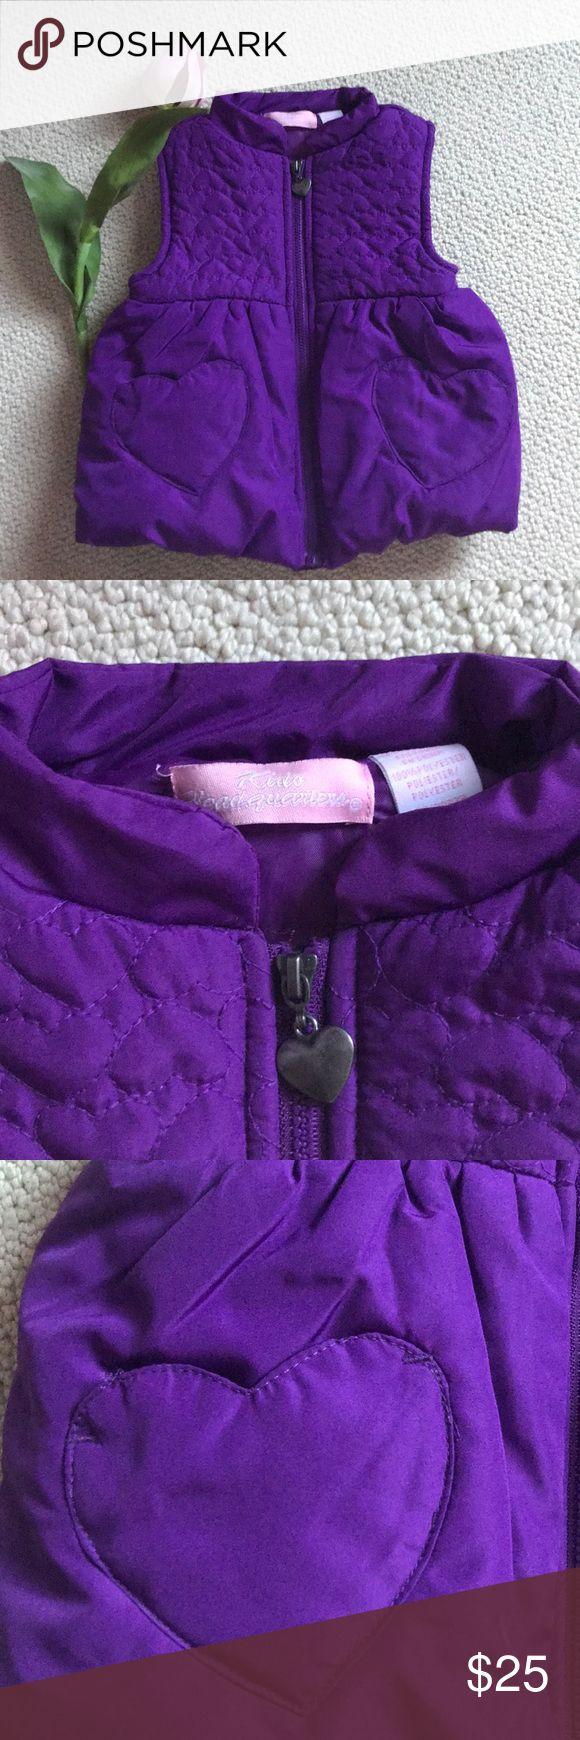 Kiddo Headquarters Purple Bubble Vest 💜 Purple Bubble Vest with heart pockets 💜 by Kiddo Headquarters- like new! Kiddo Headquarters Jackets & Coats Vests